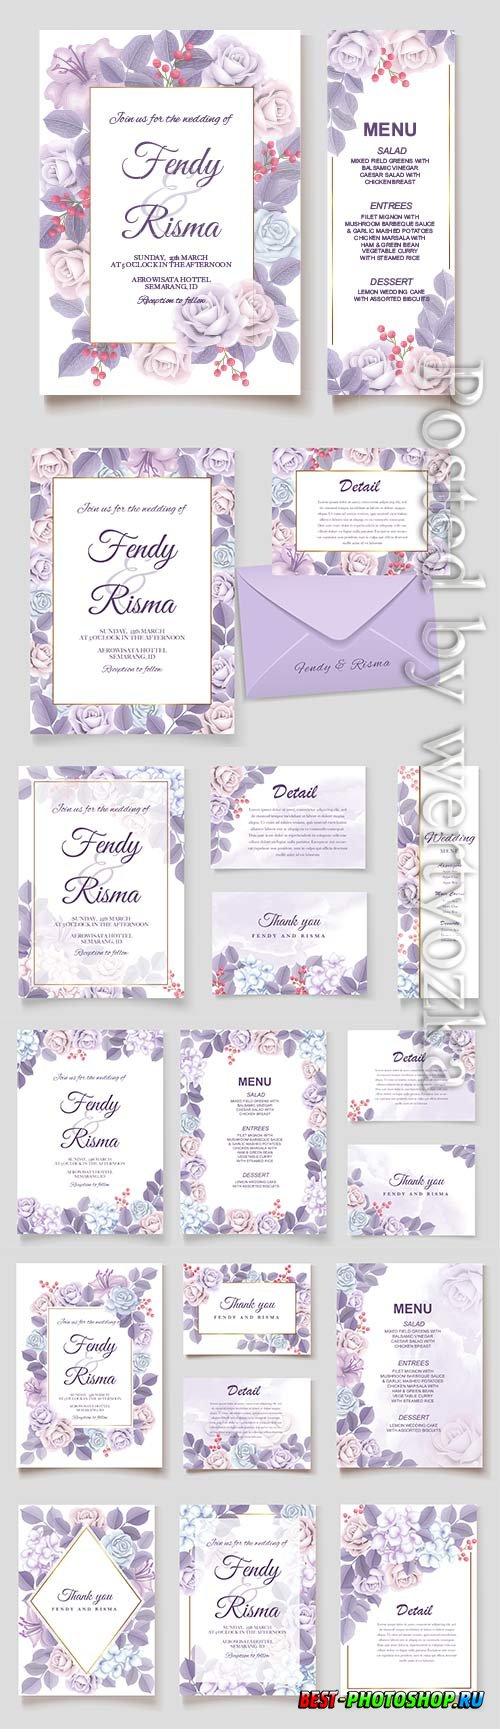 Elegant vector wedding invitation floral design